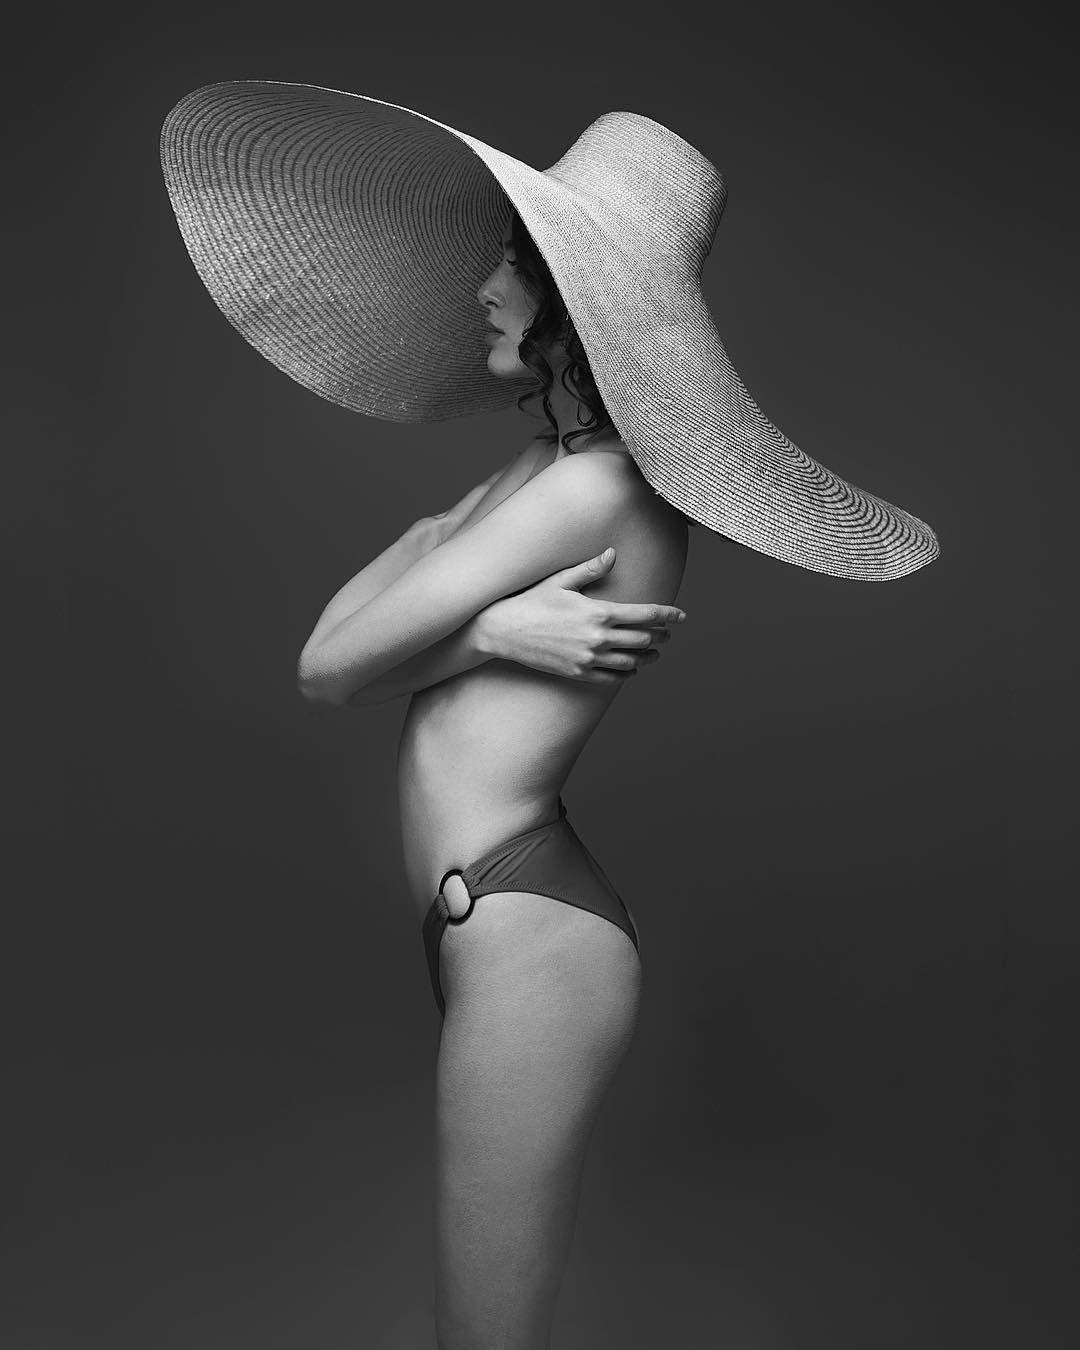 beautiful_black_and_white_portrait_photography_24.jpg